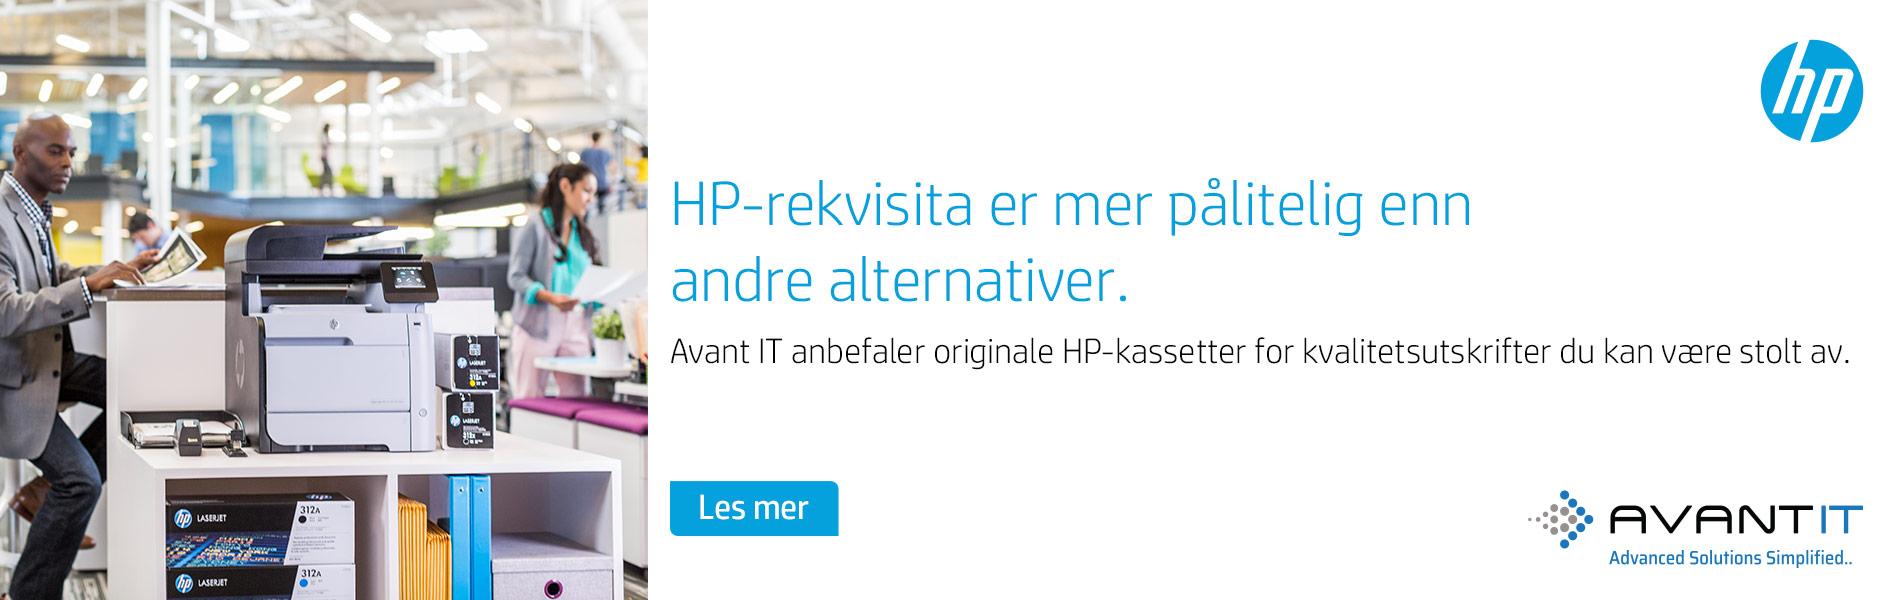 HP Rekvisita